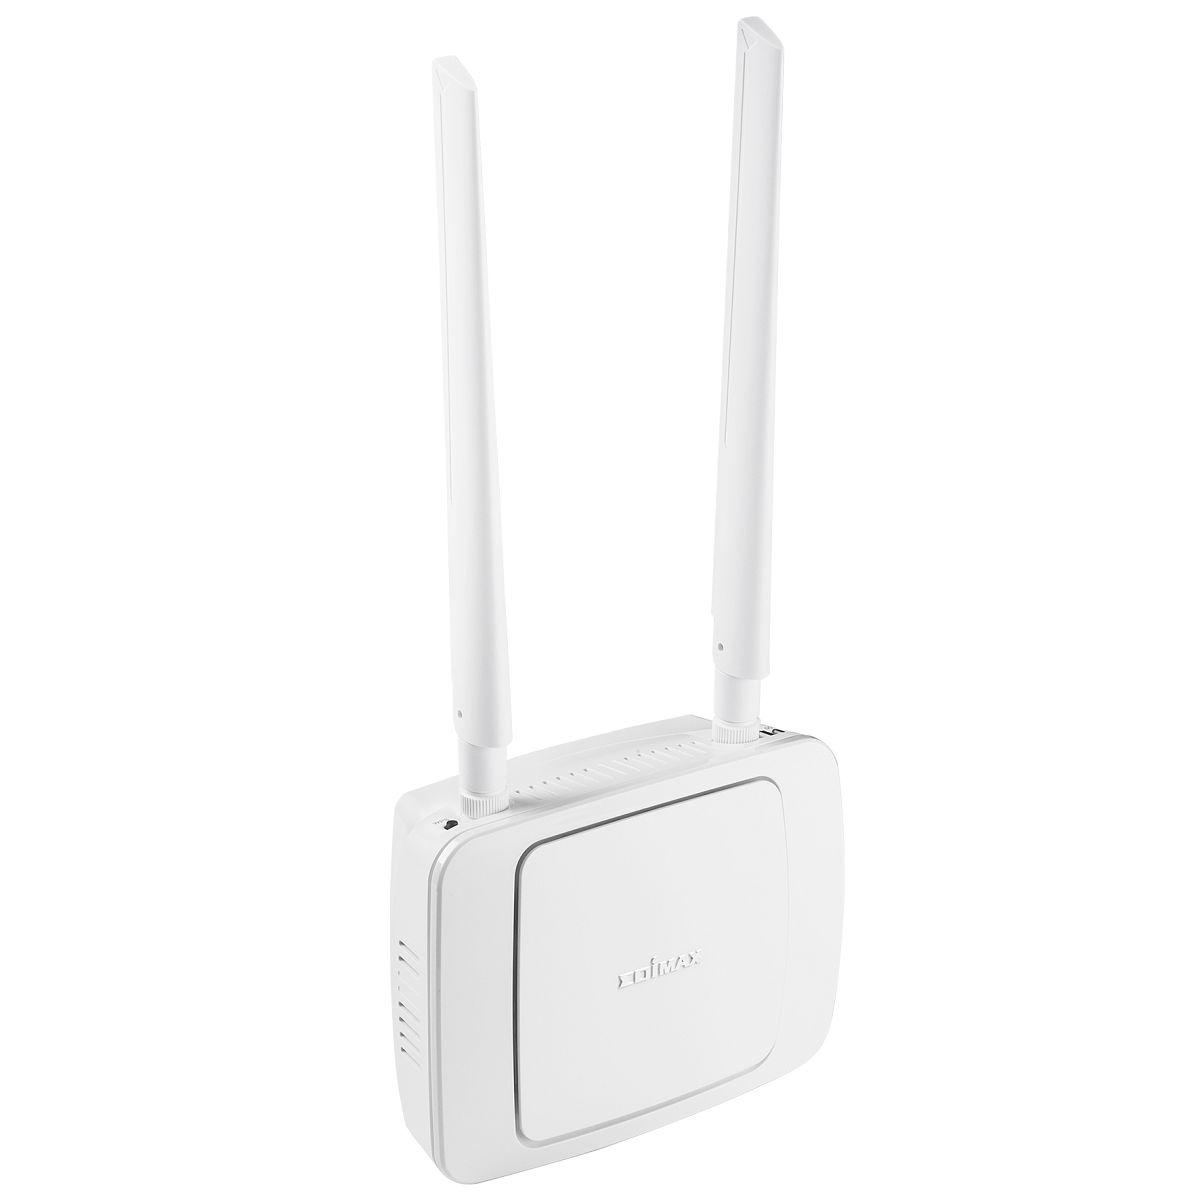 Edimax Technology Co., Ltd.-AC2600 MU-MIMO Gigabit Home Wi-Fi Roaming Extender